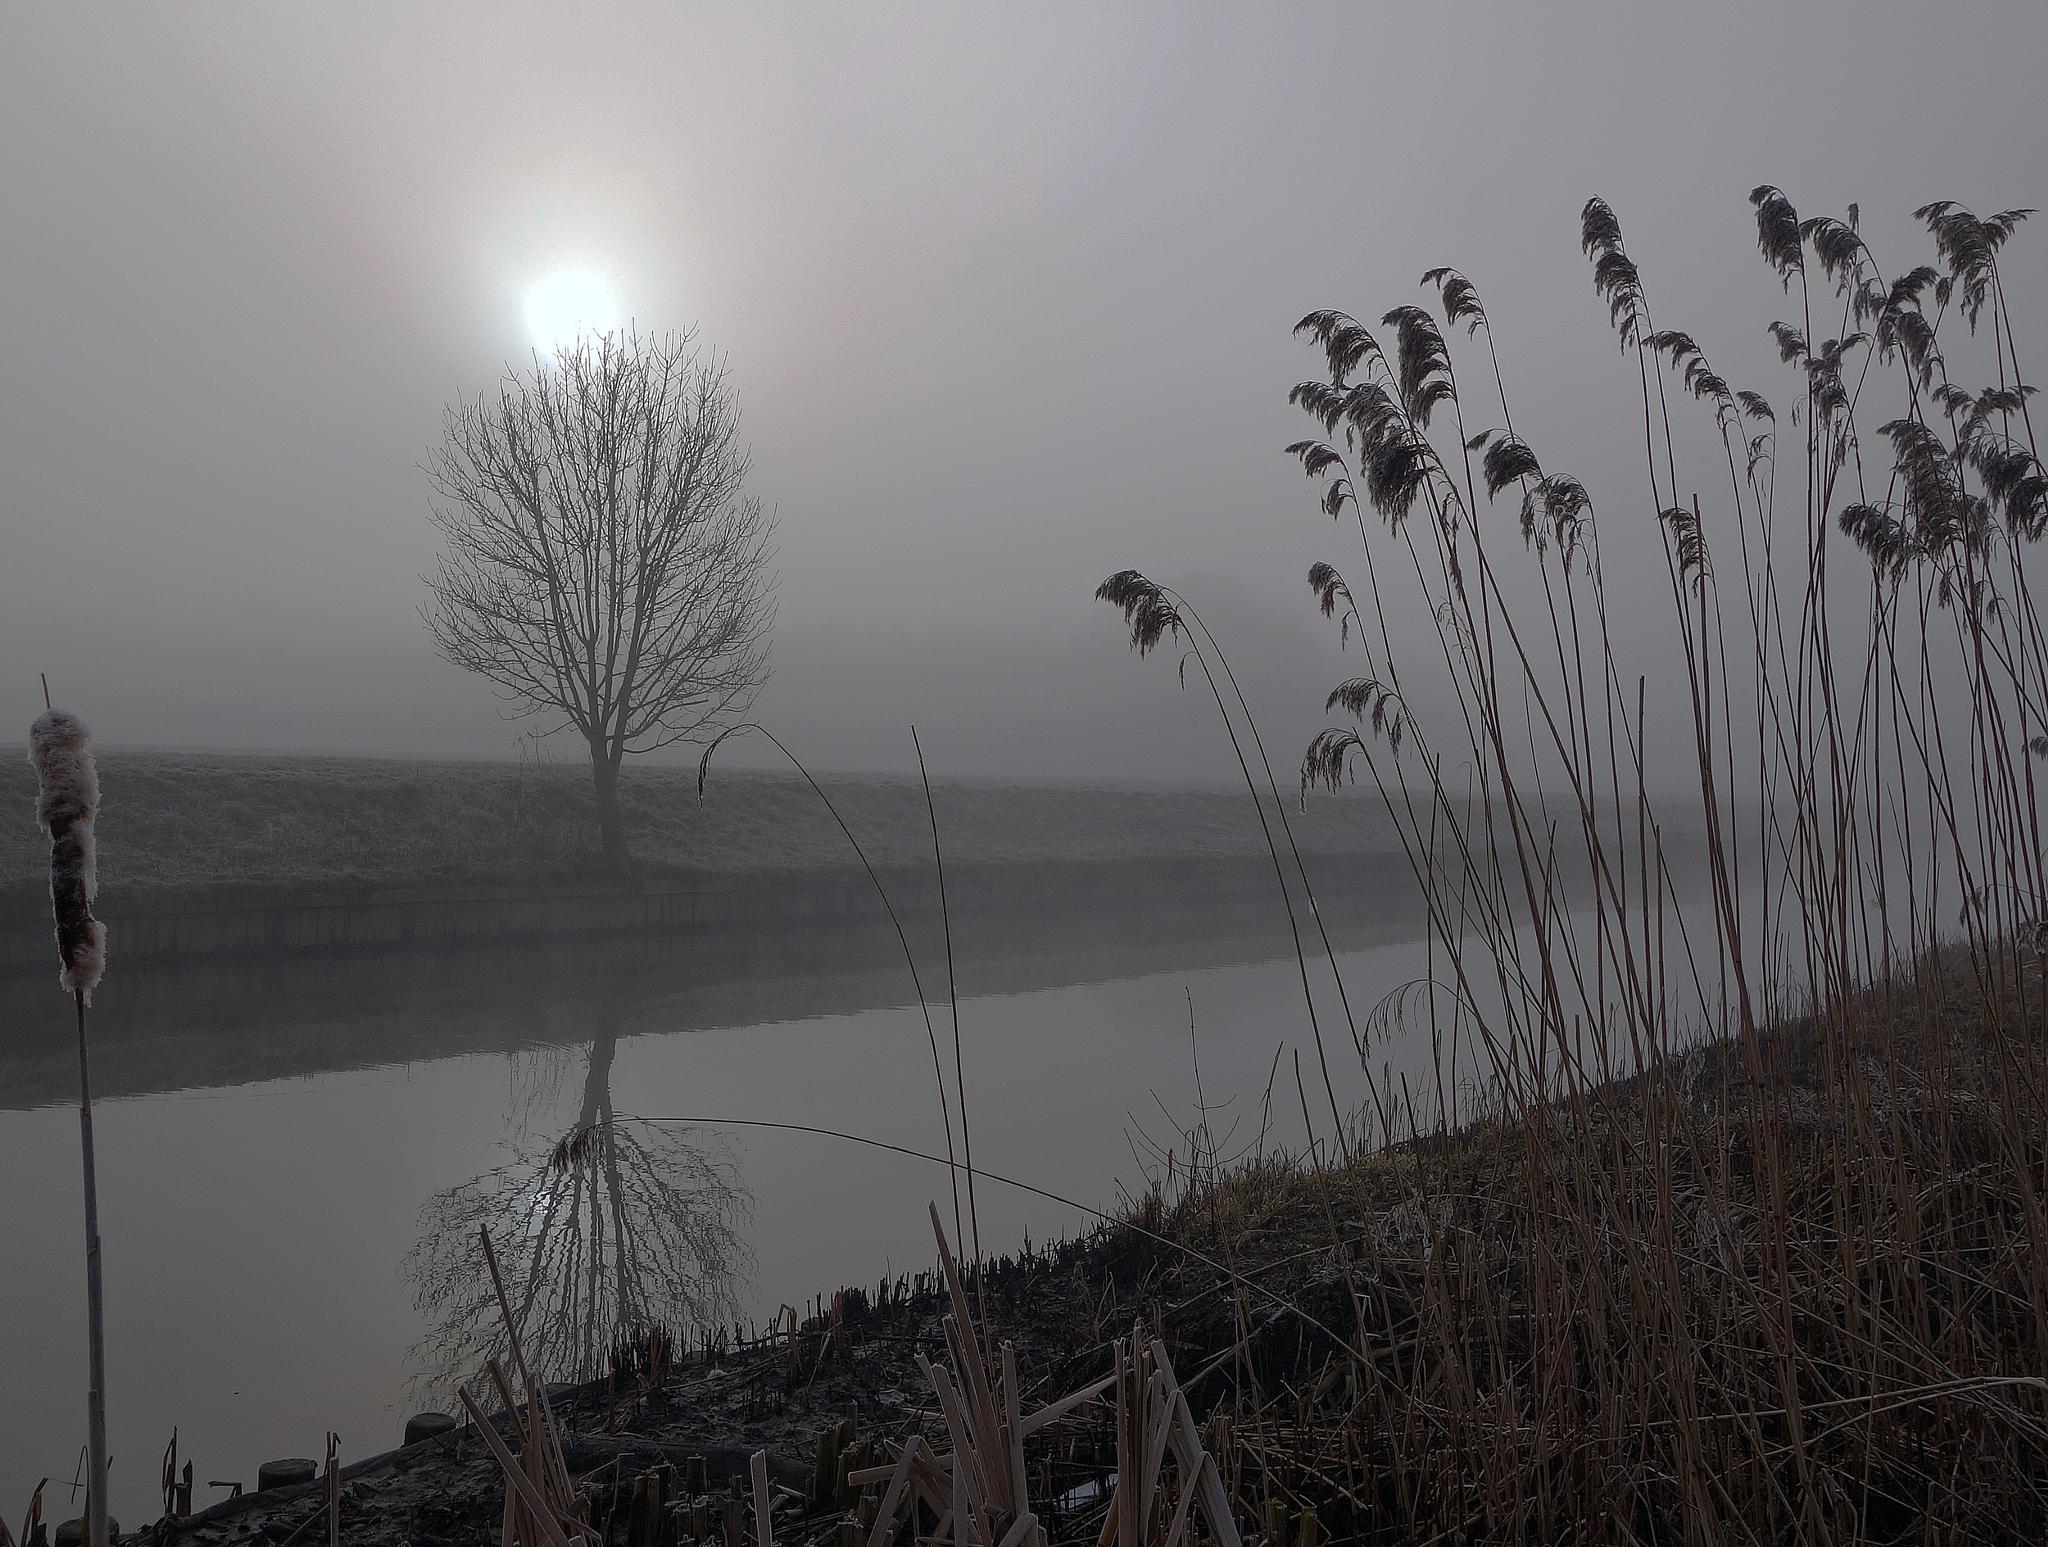 Foggy day in Odijk by hugodejong35